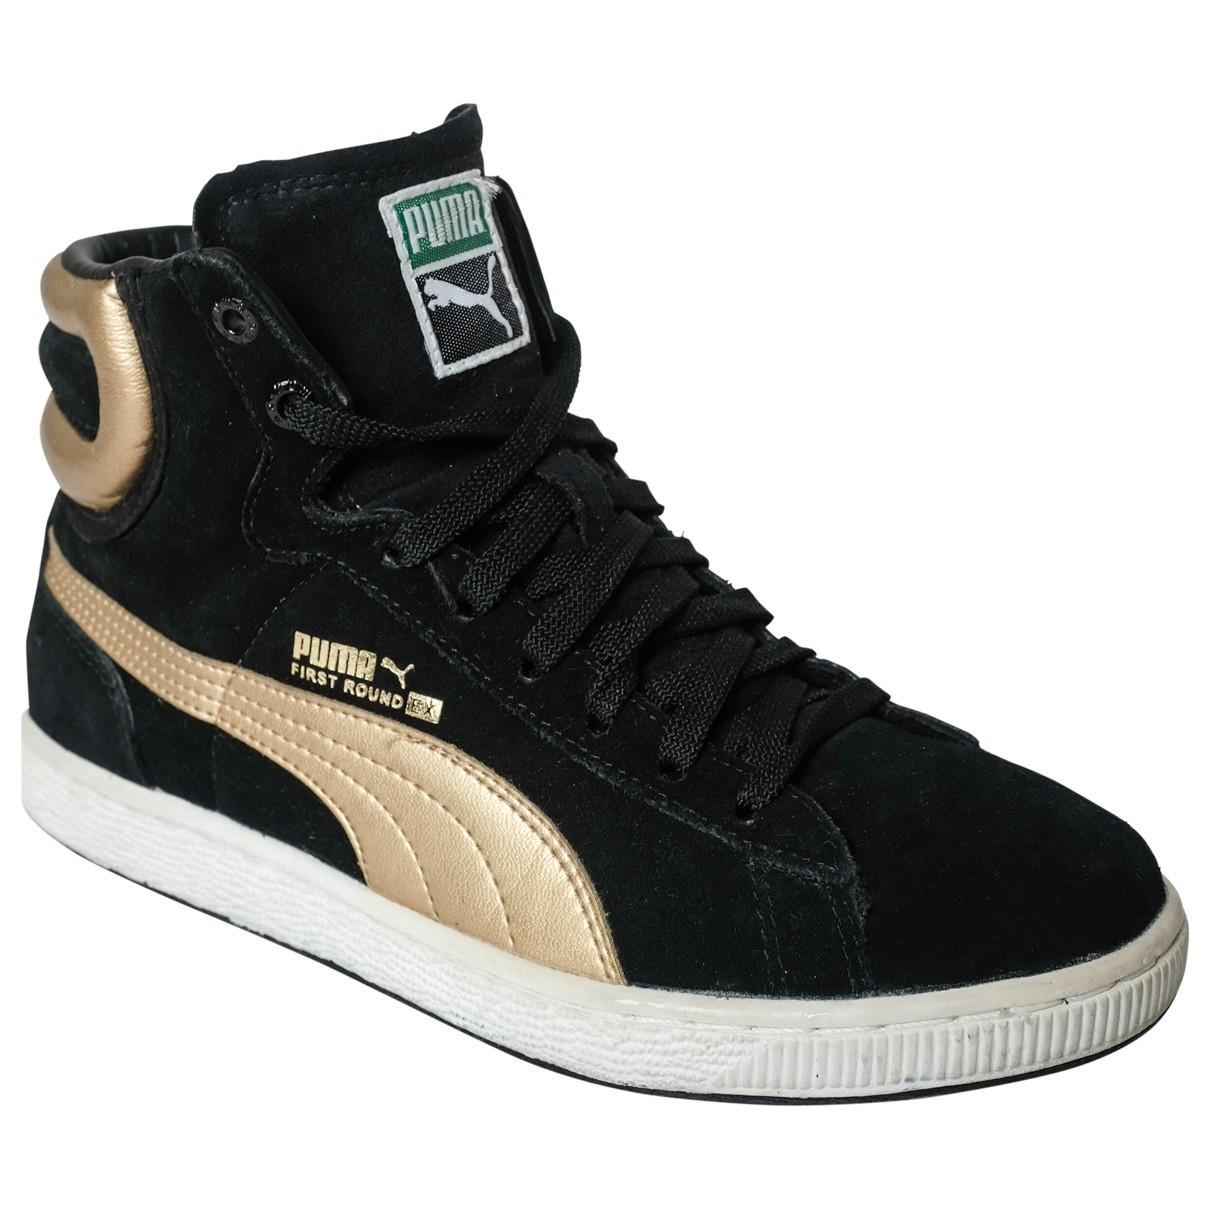 Puma \N Black Leather Trainers for Women 37 EU